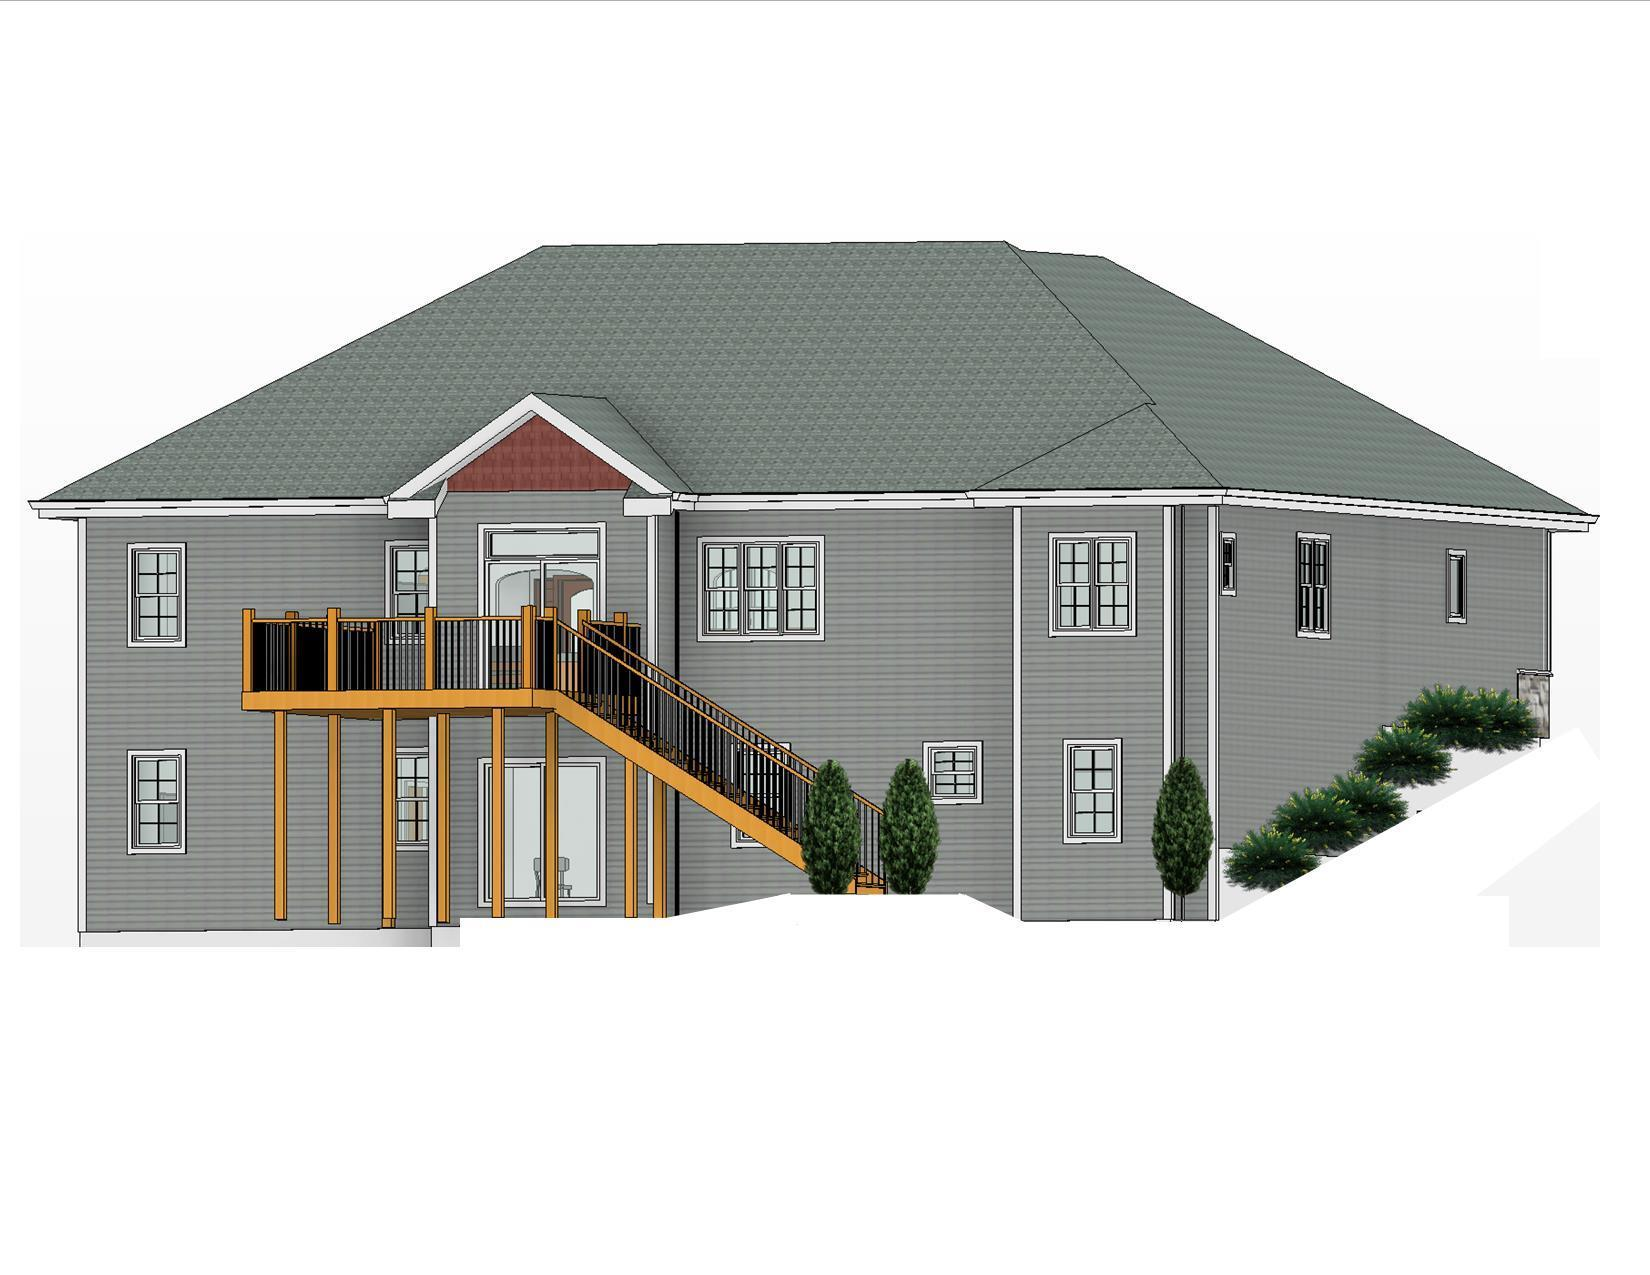 2018 Wichita Ln, Grafton, Wisconsin 53024, 3 Bedrooms Bedrooms, 8 Rooms Rooms,2 BathroomsBathrooms,Single-family,For Sale,Wichita Ln,1708791